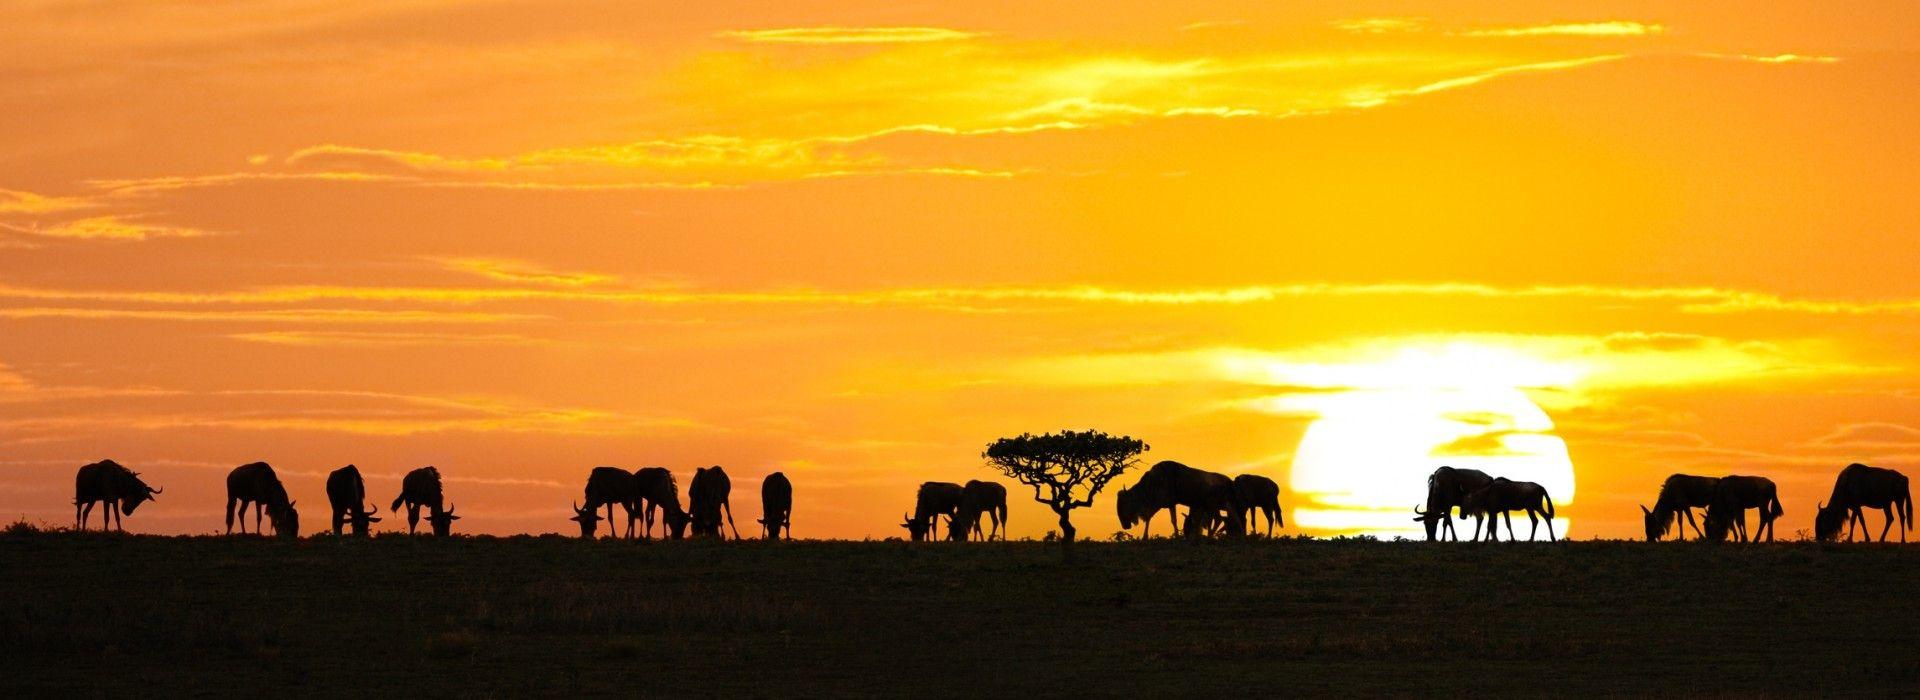 Adventure Tours in Serengeti National Park